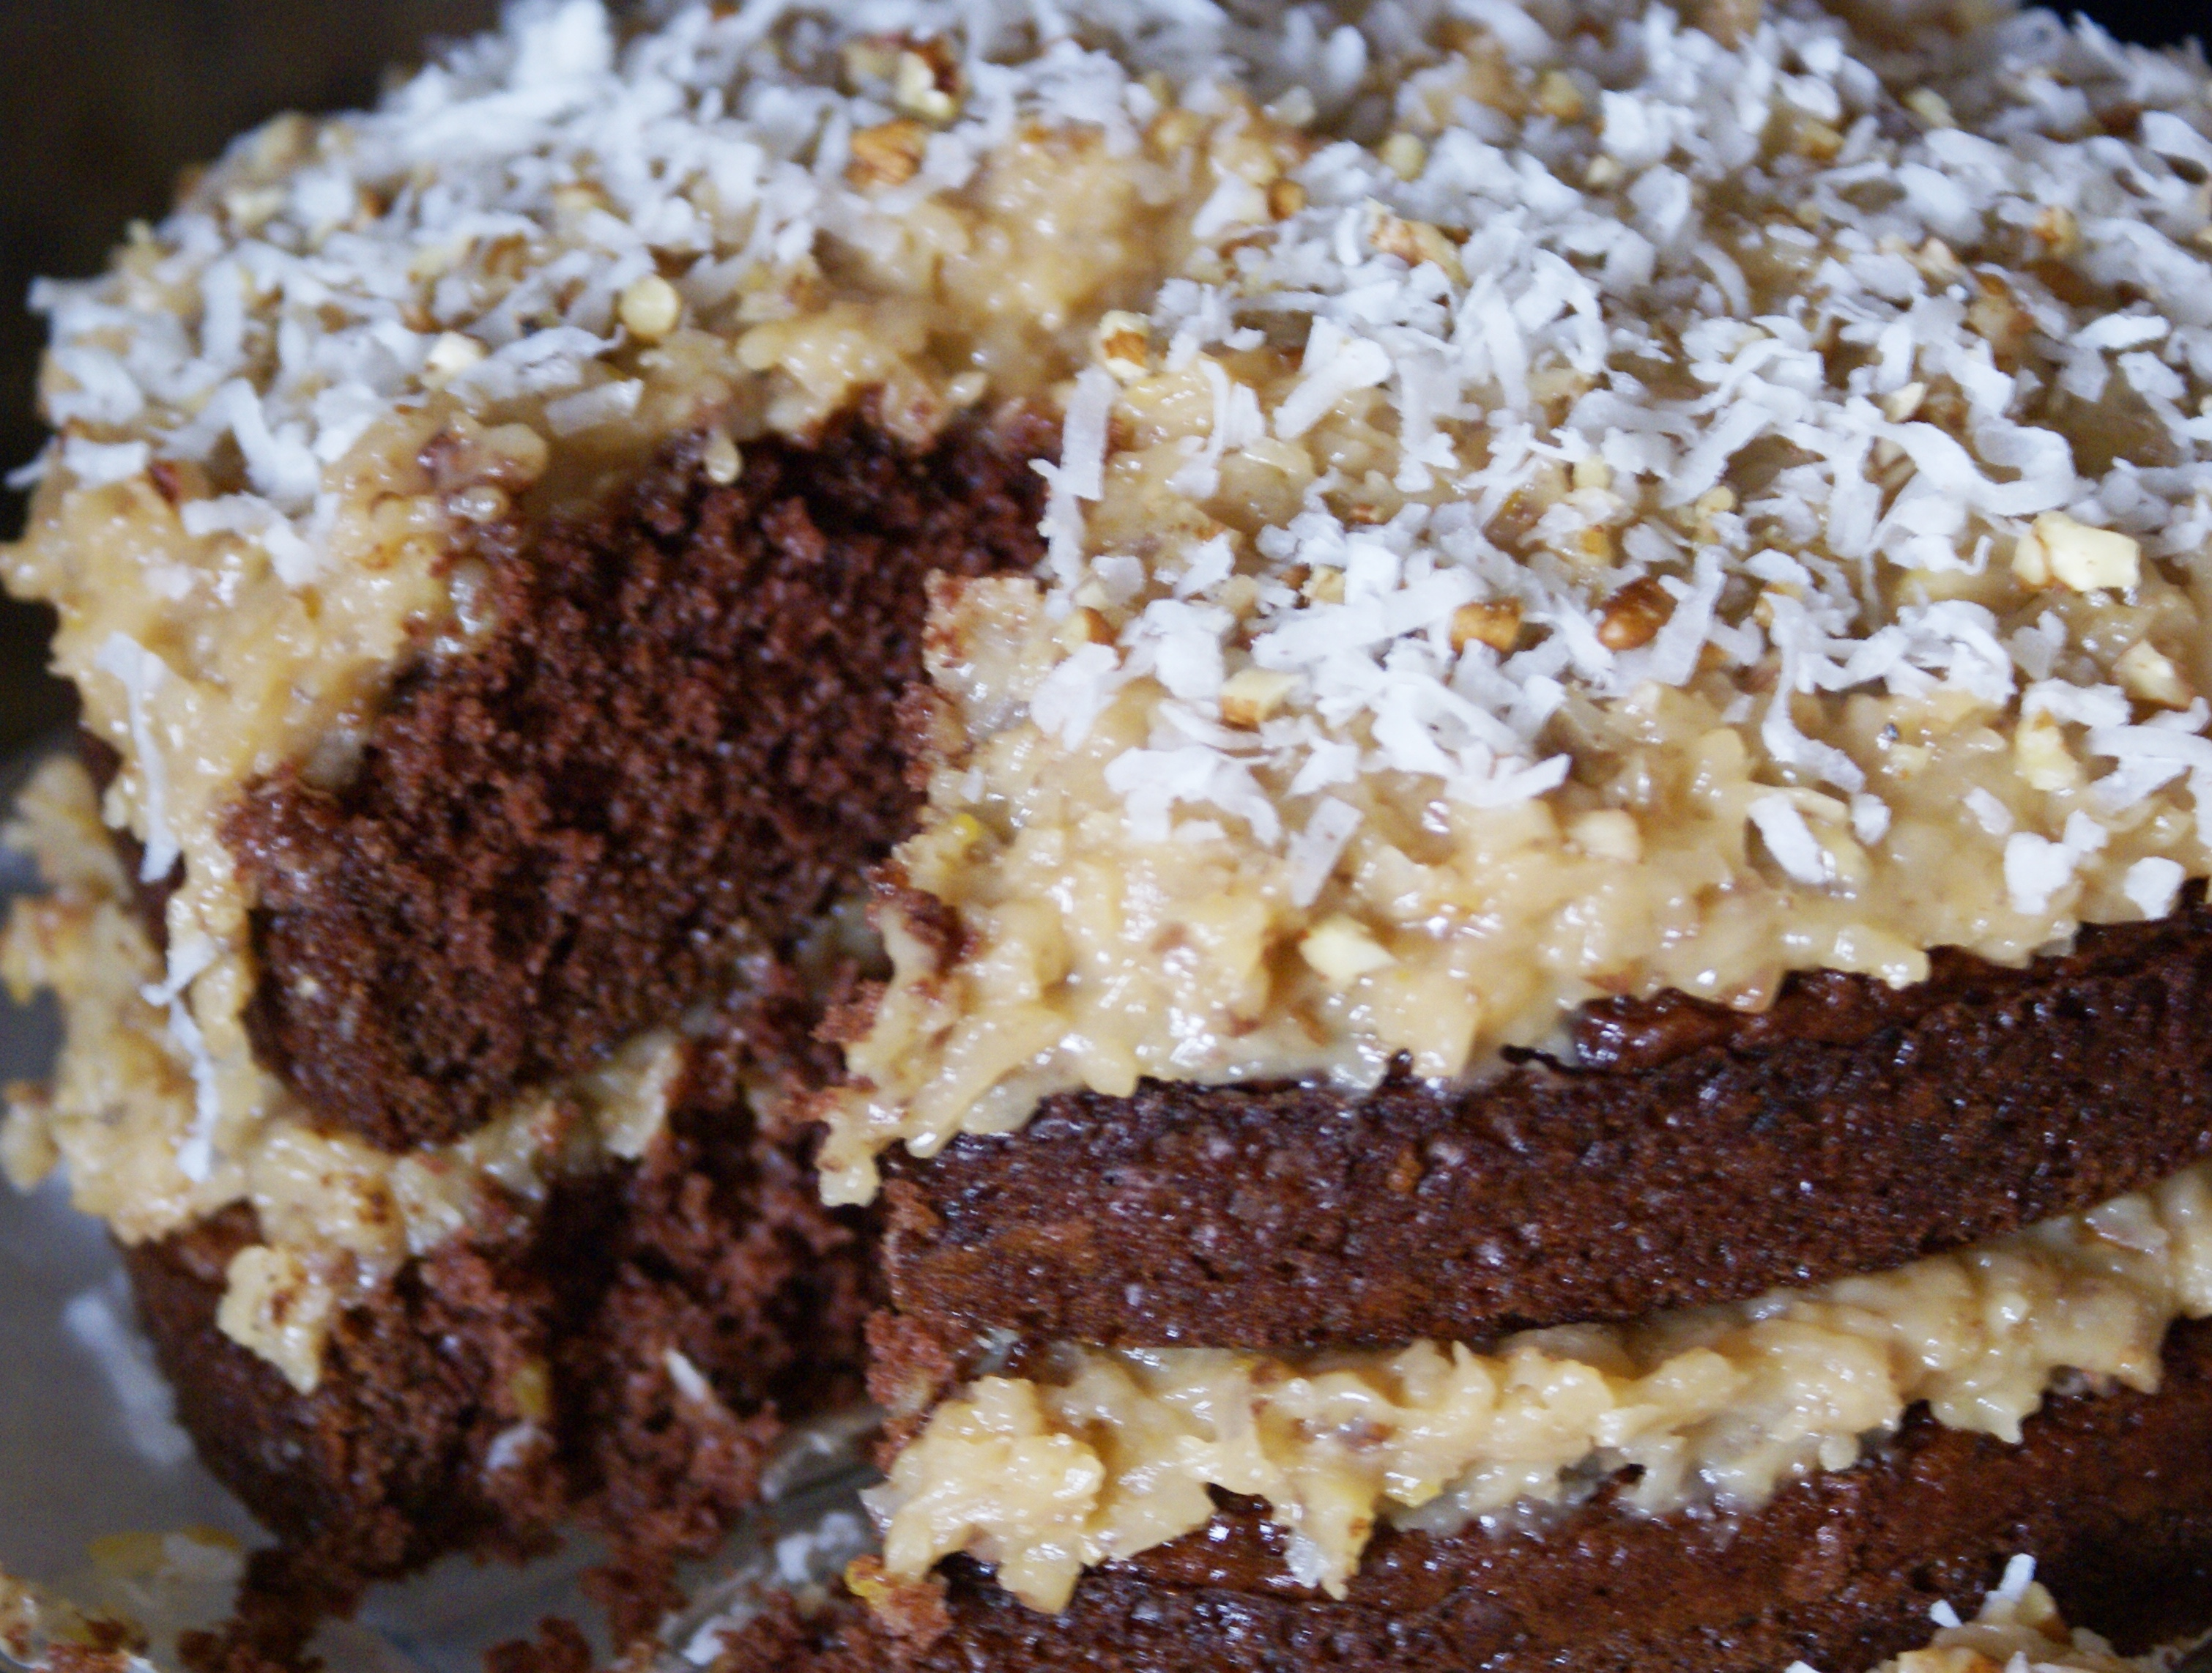 homemade cake icing Photo